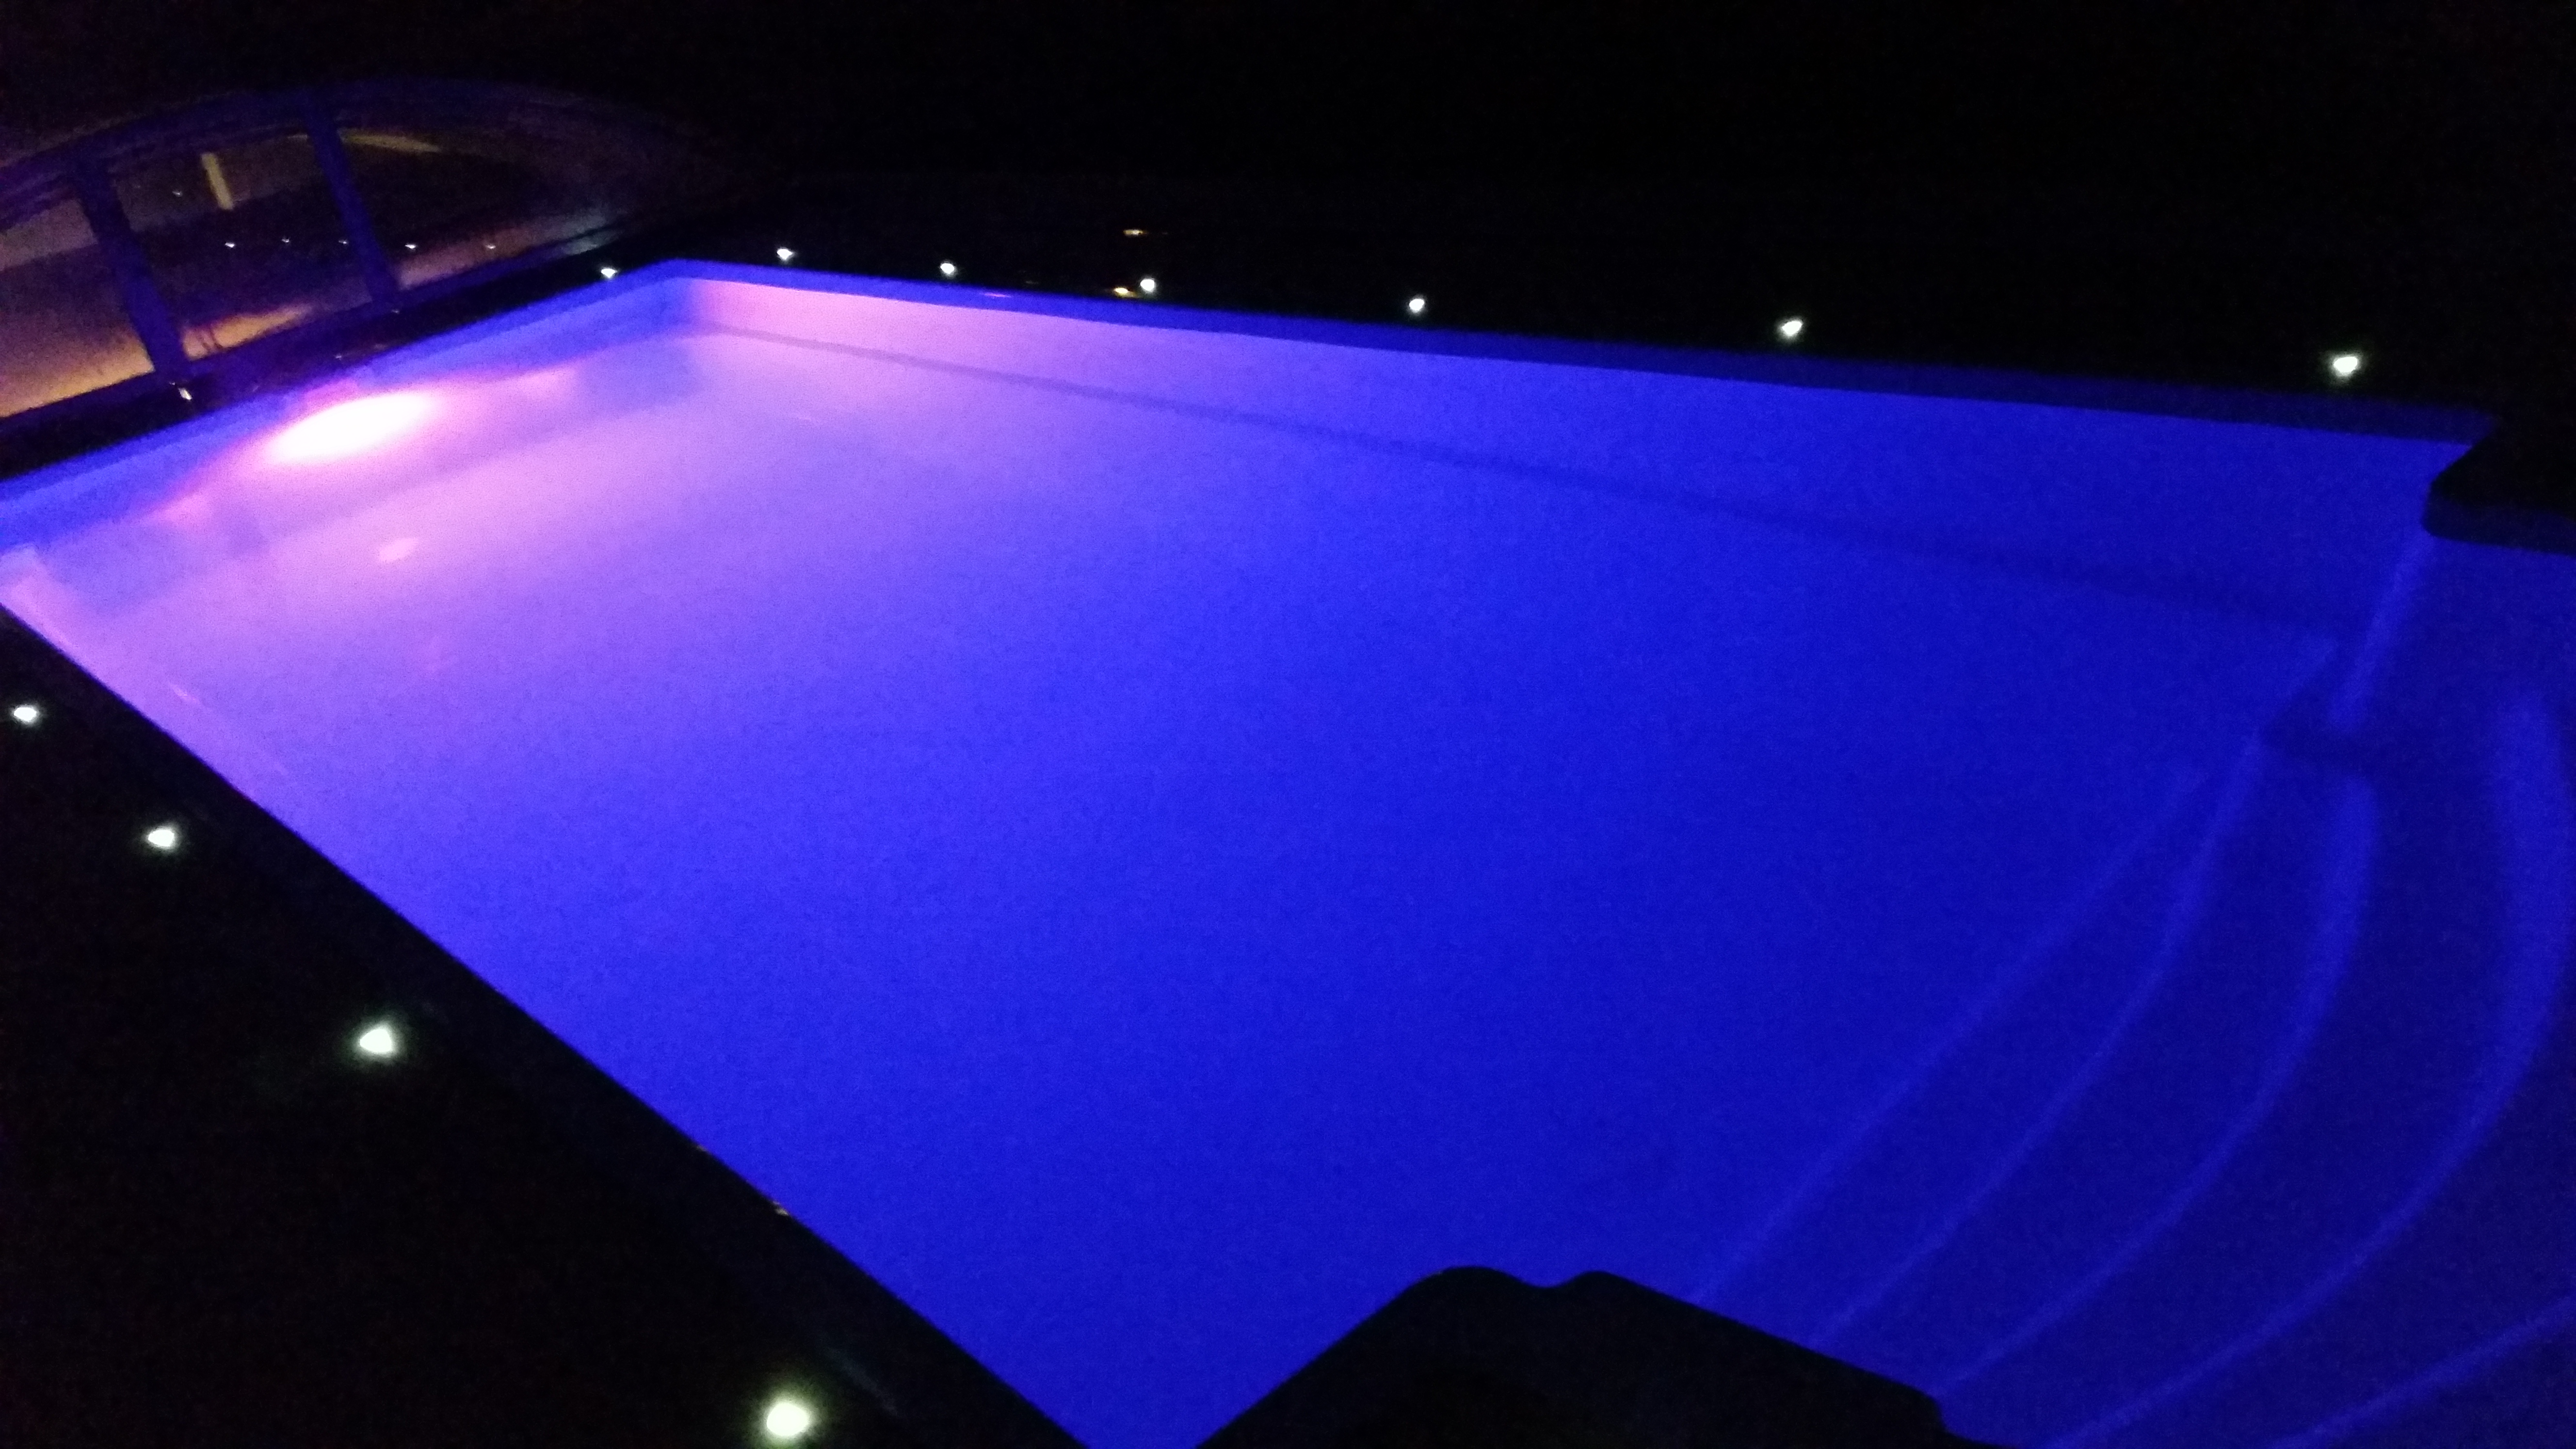 Hydro glassfiberbasseng lilla lys